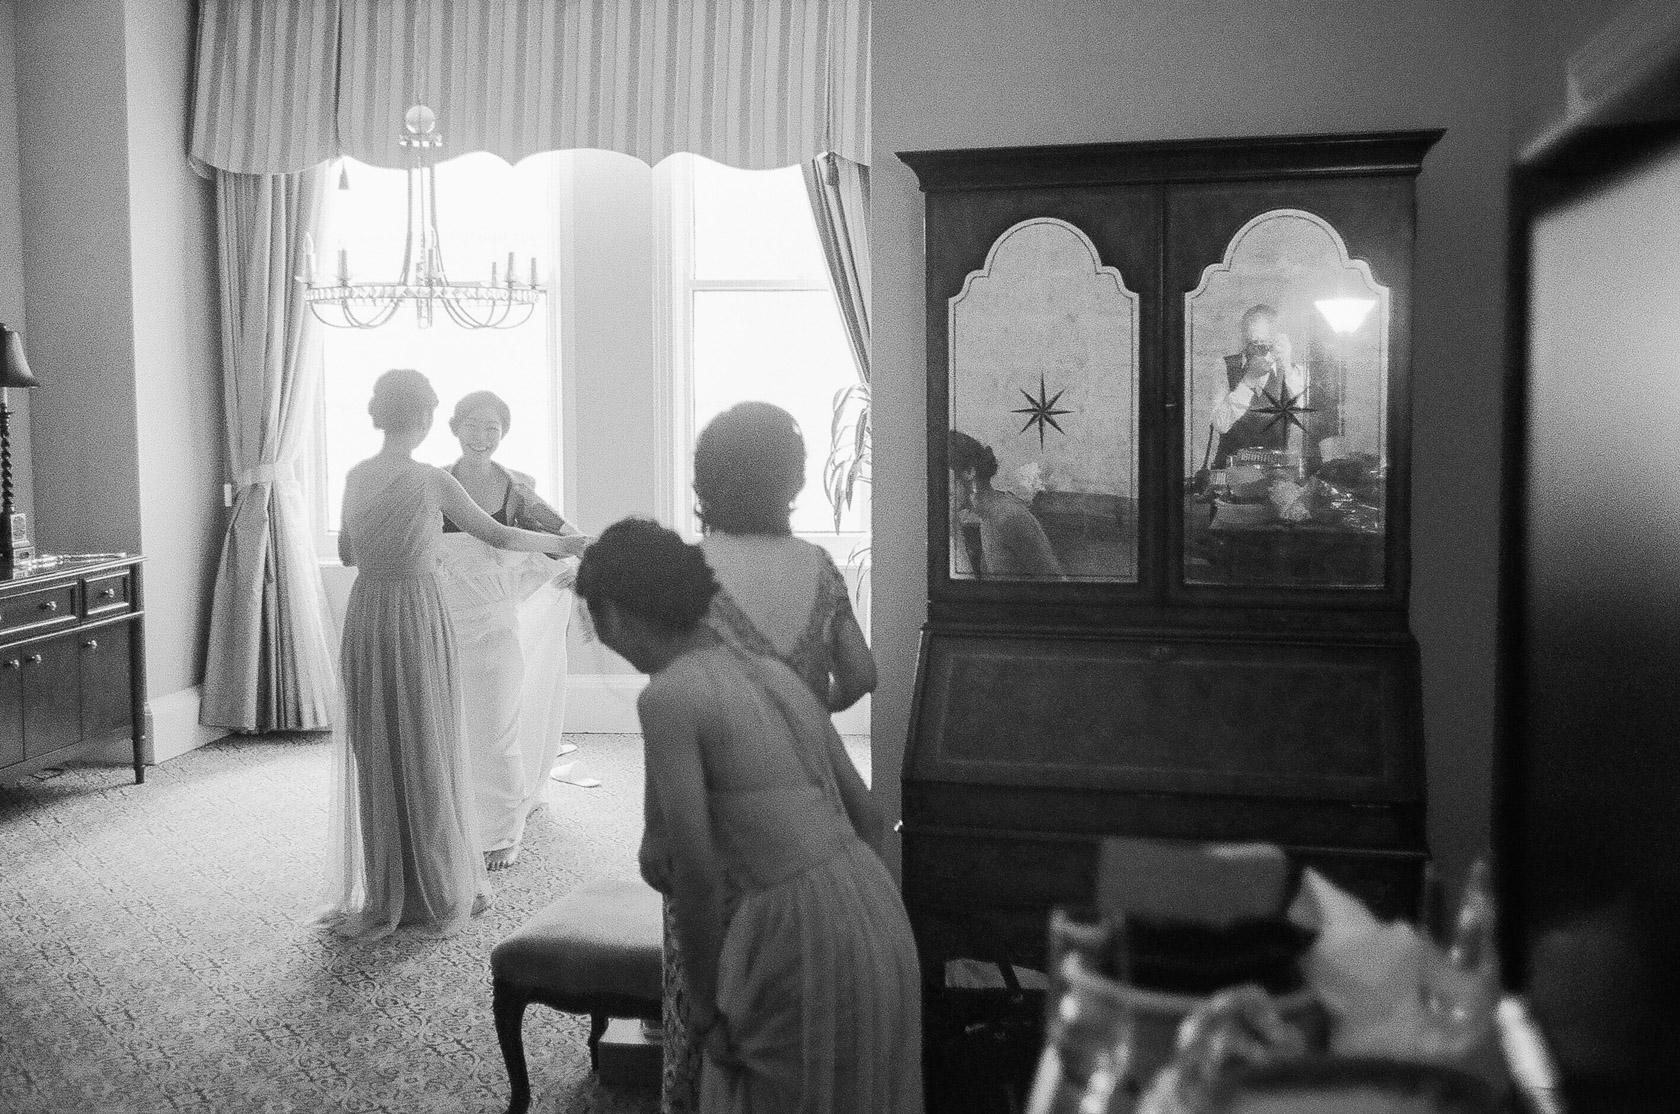 10-New Orleans Wedding on Film